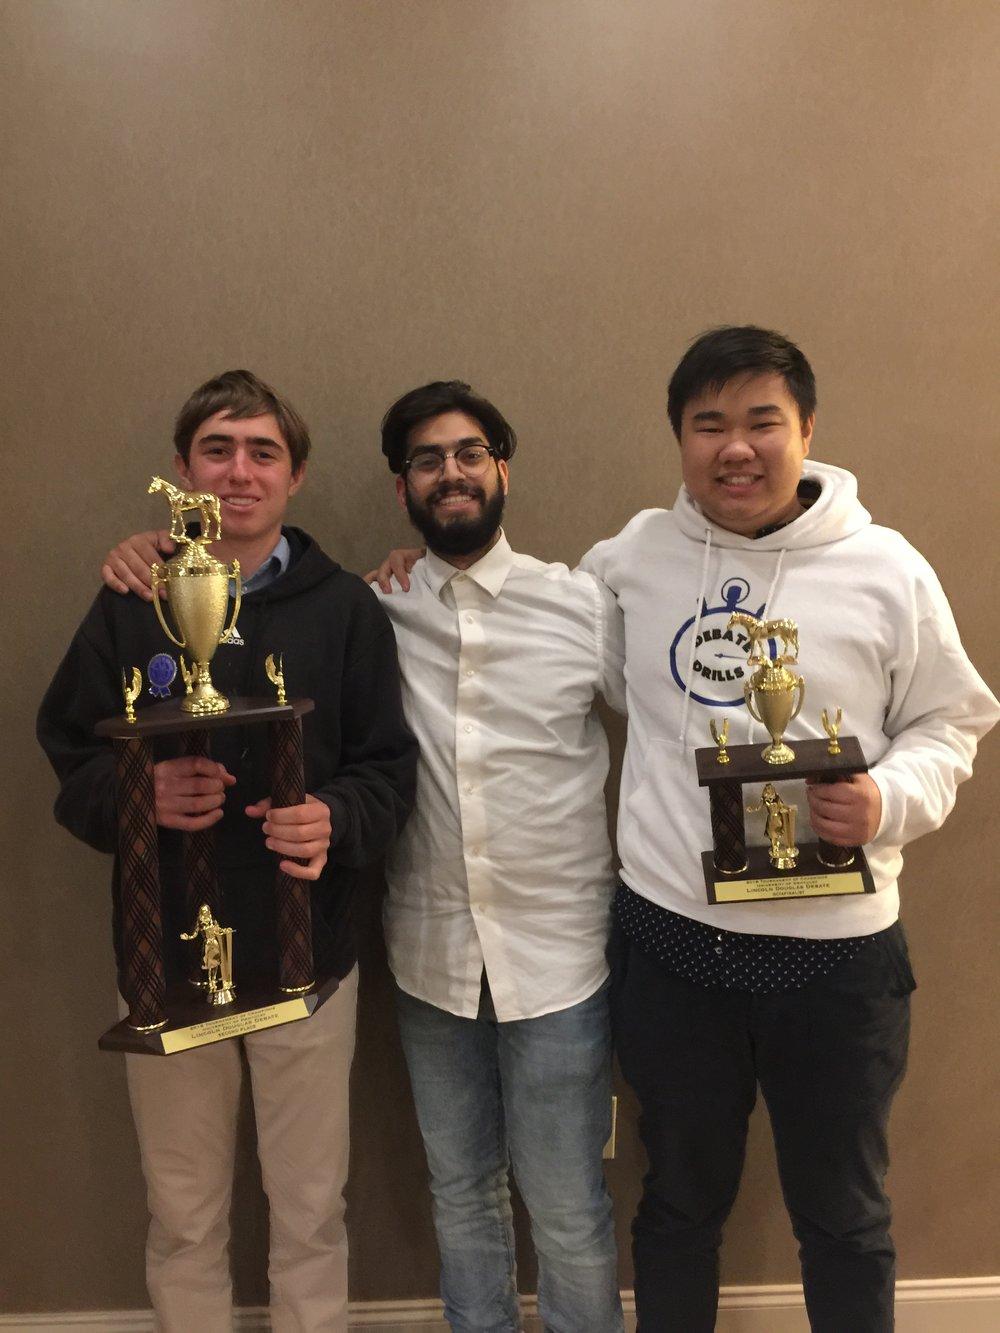 Rex Evans (Santa Monica High School) and Eric Deng (San Marino High School) celebrate a successful 2018 TOC.